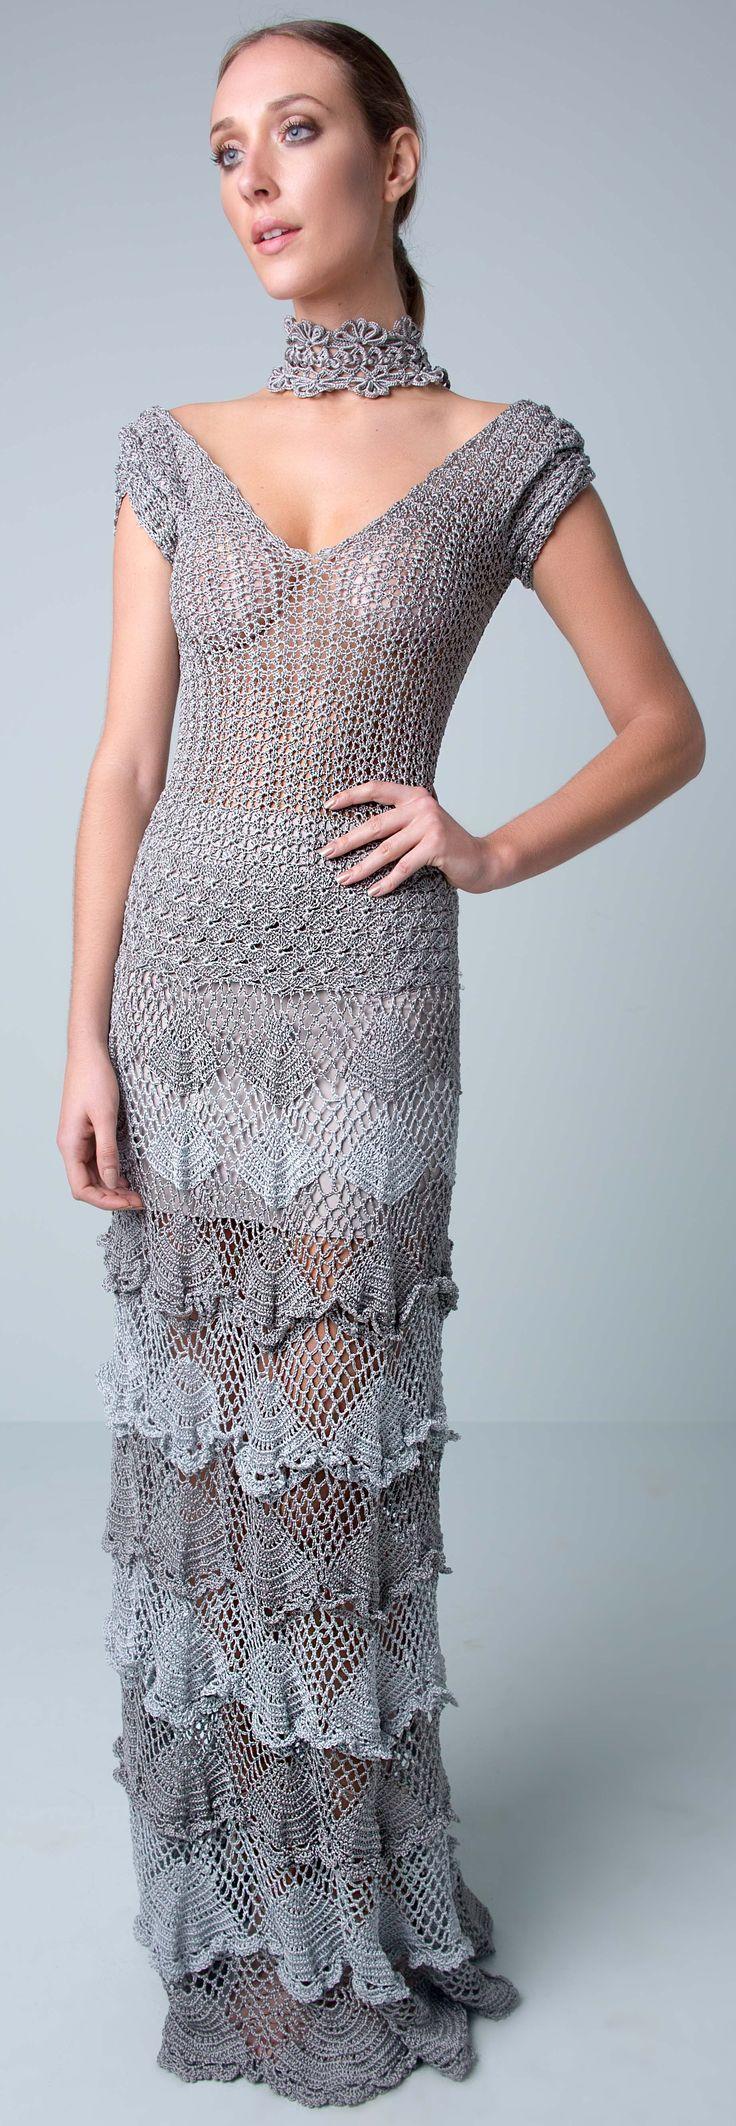 697 best ♡♥♡ robes au crochet - dress crochet images on Pinterest ...